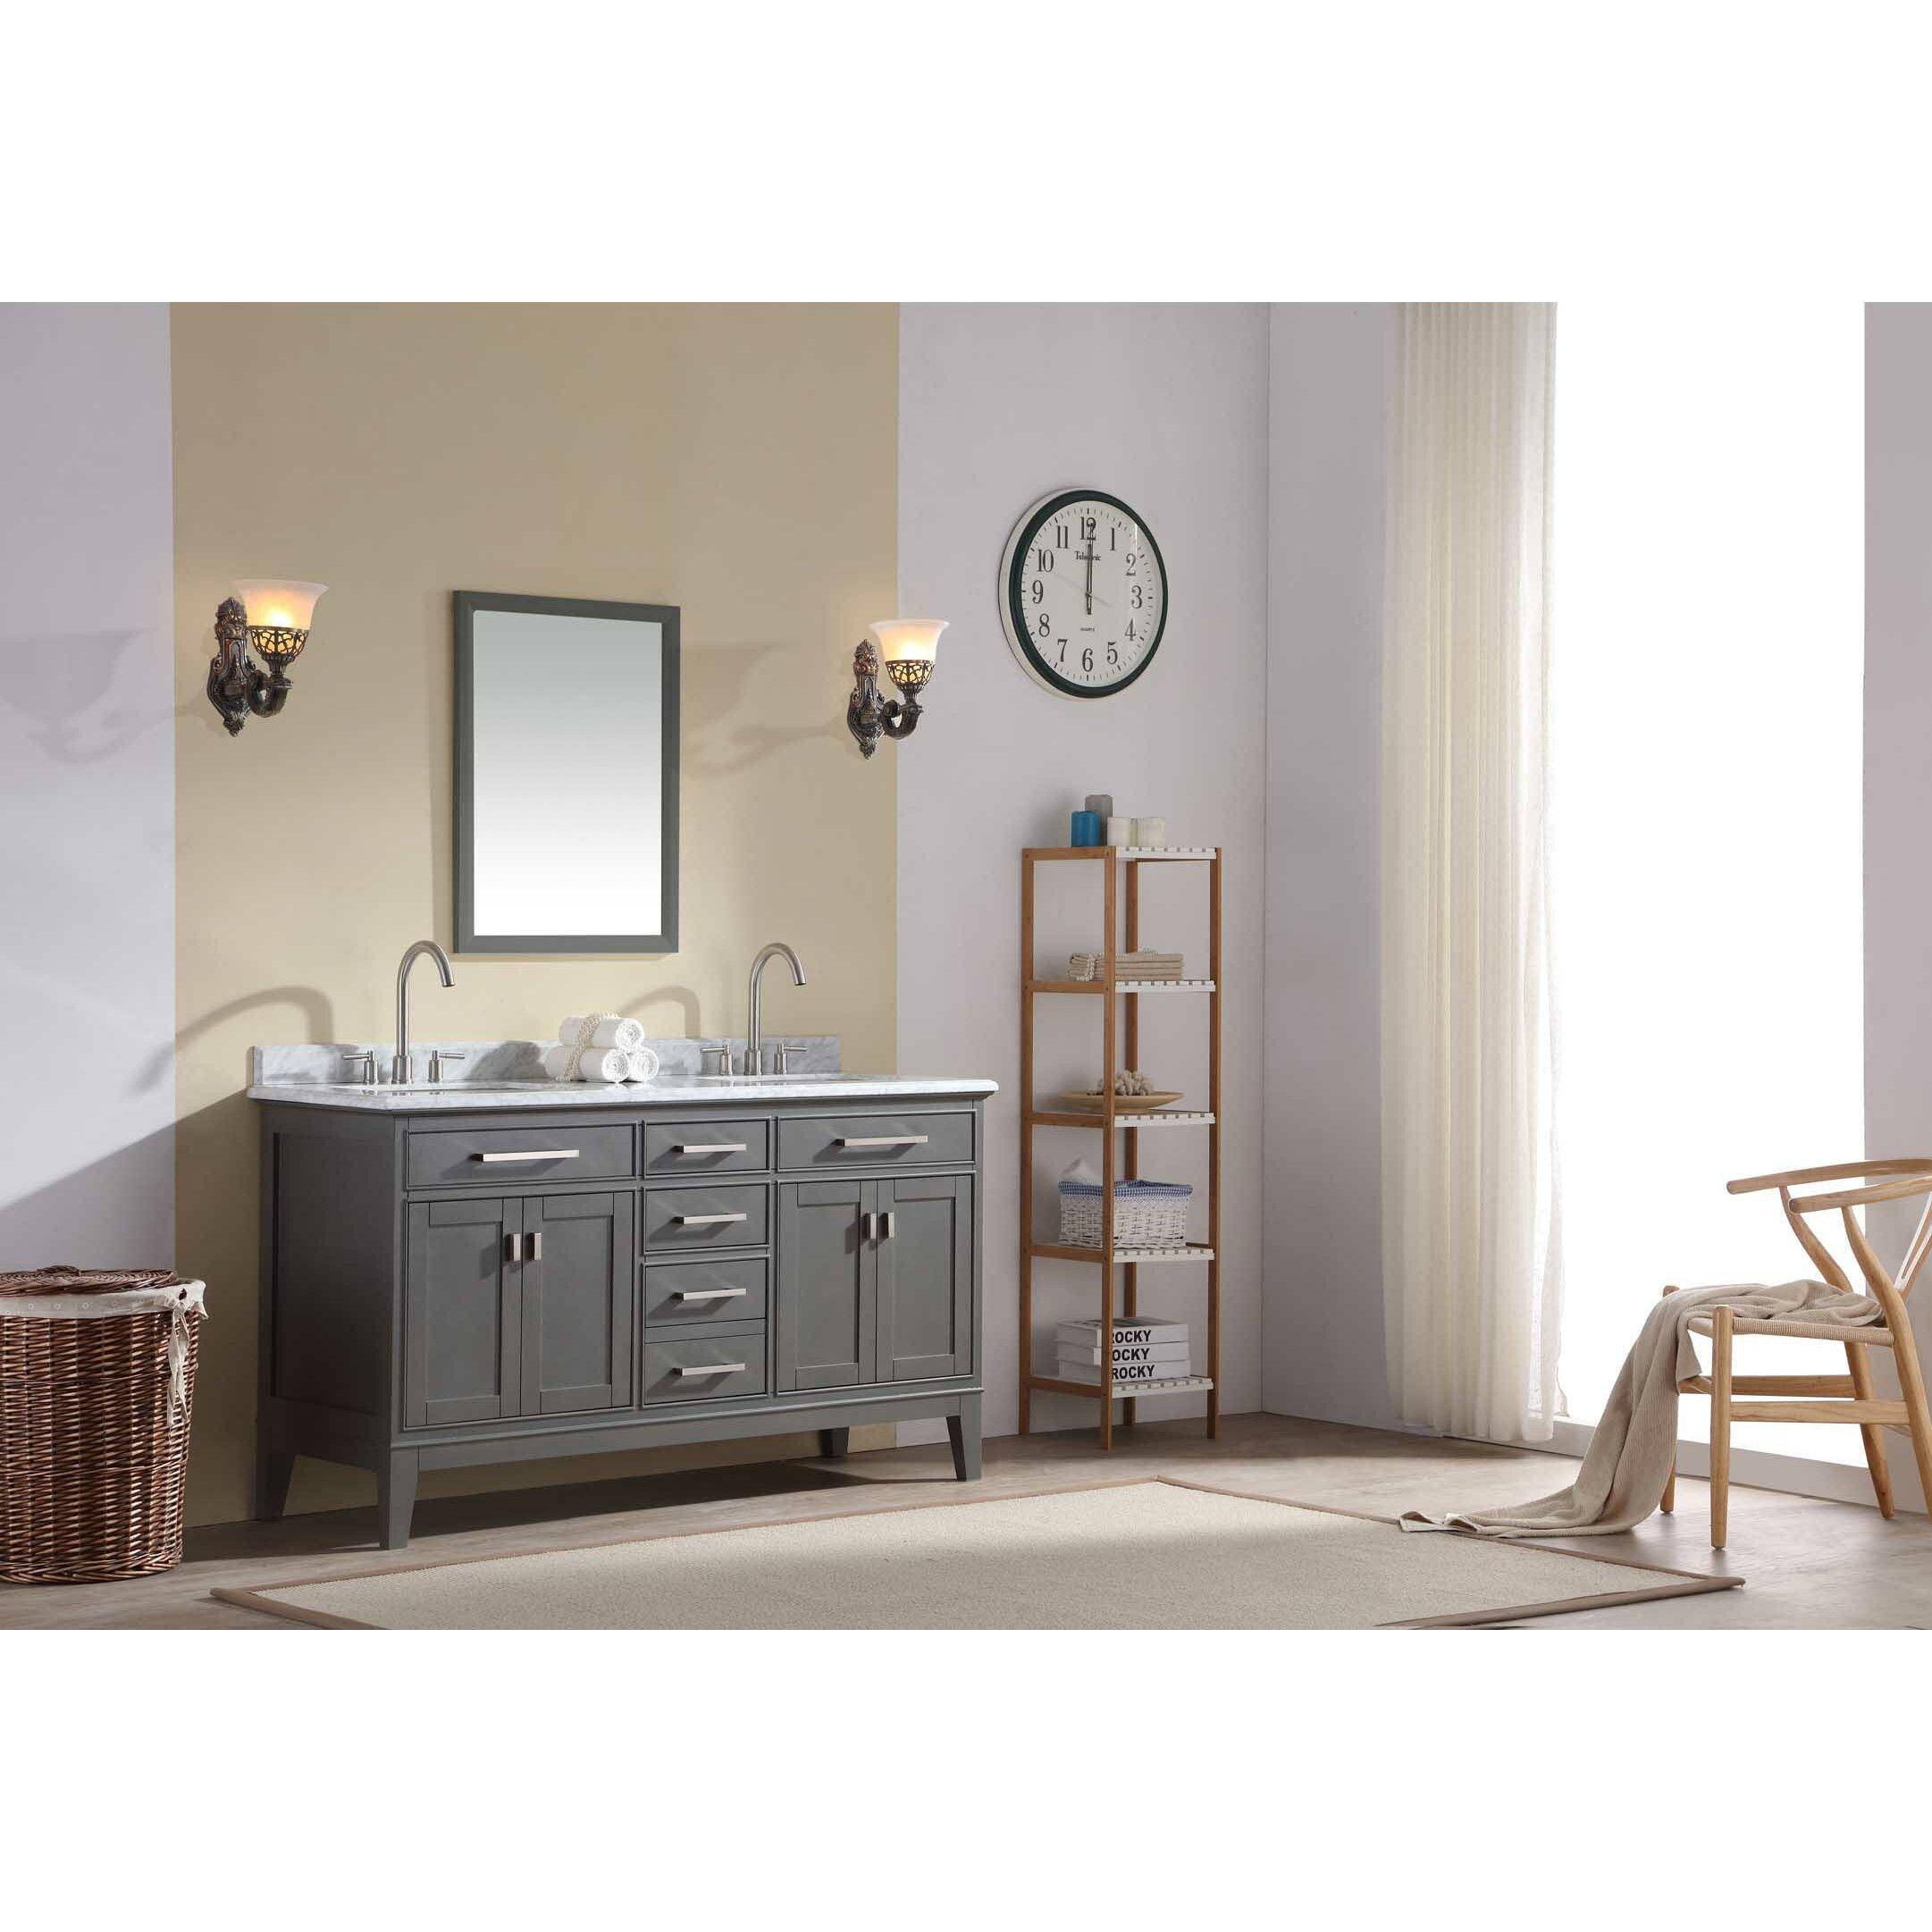 Kitchen And Bathroom Ari Kitchen Bath Danny 60 Double Bathroom Vanity Set Reviews